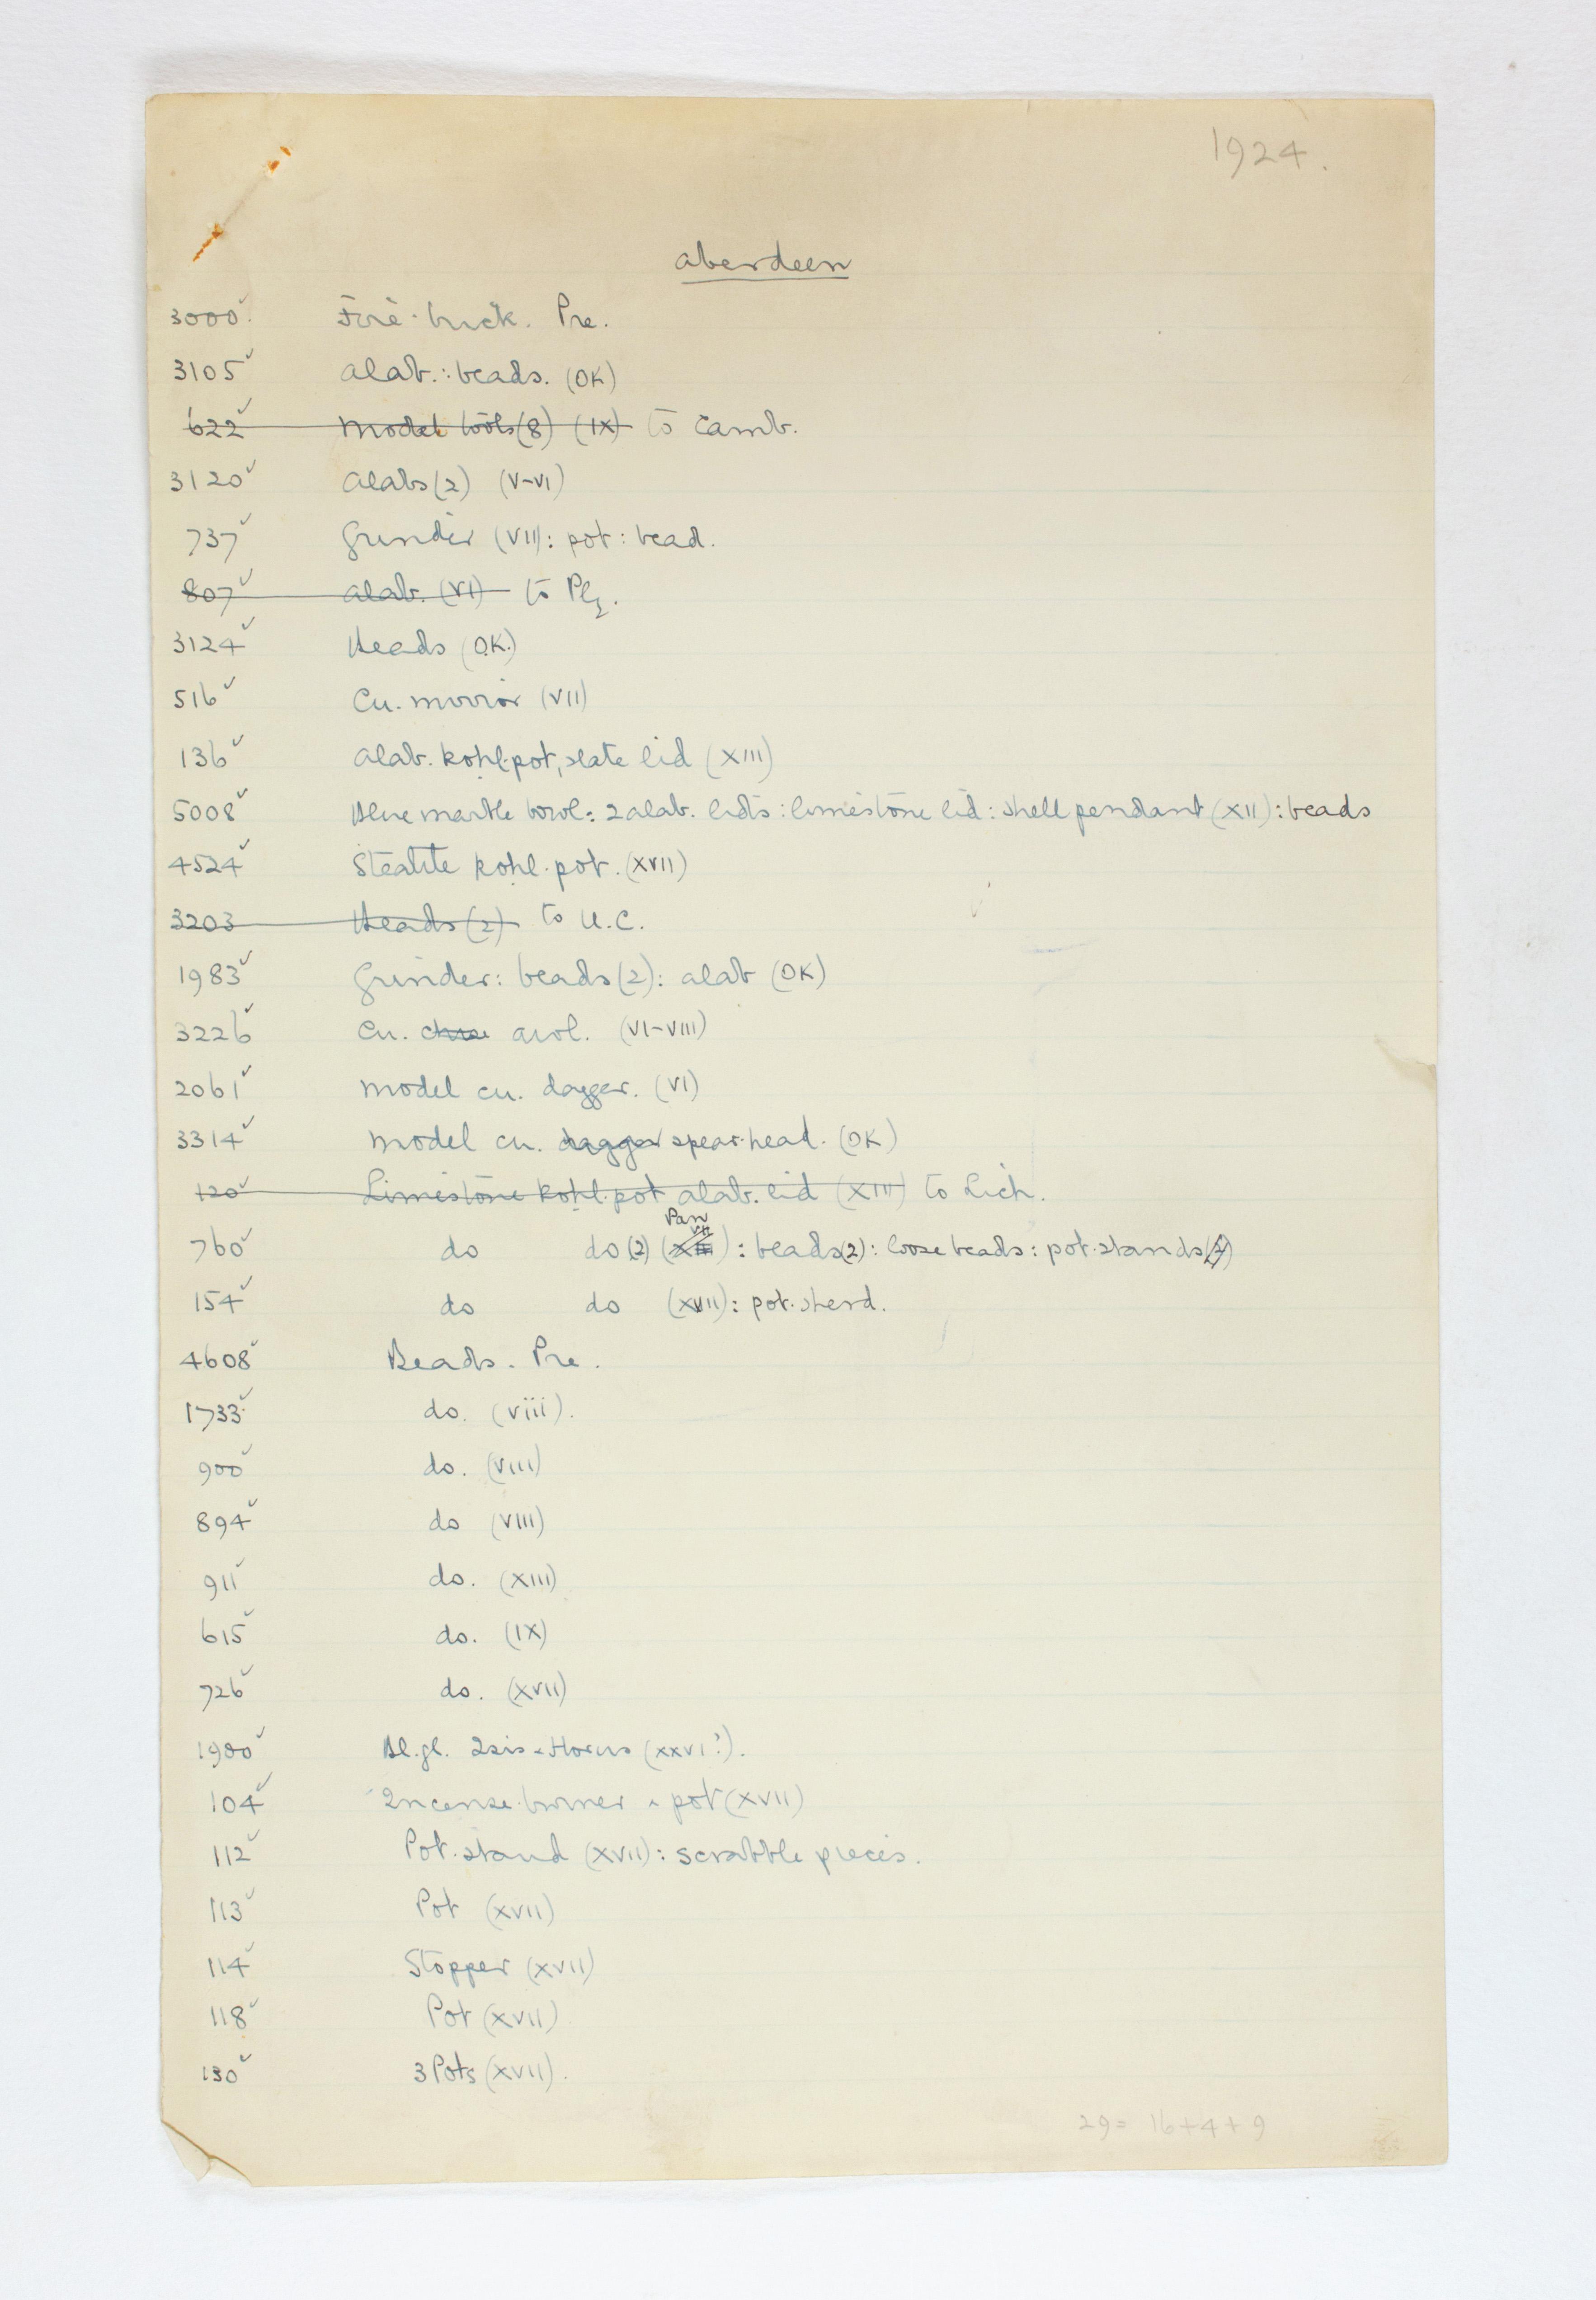 1923-24 Qau el-Kebir, Hemamieh Individual institution list PMA/WFP1/D/27/2.1